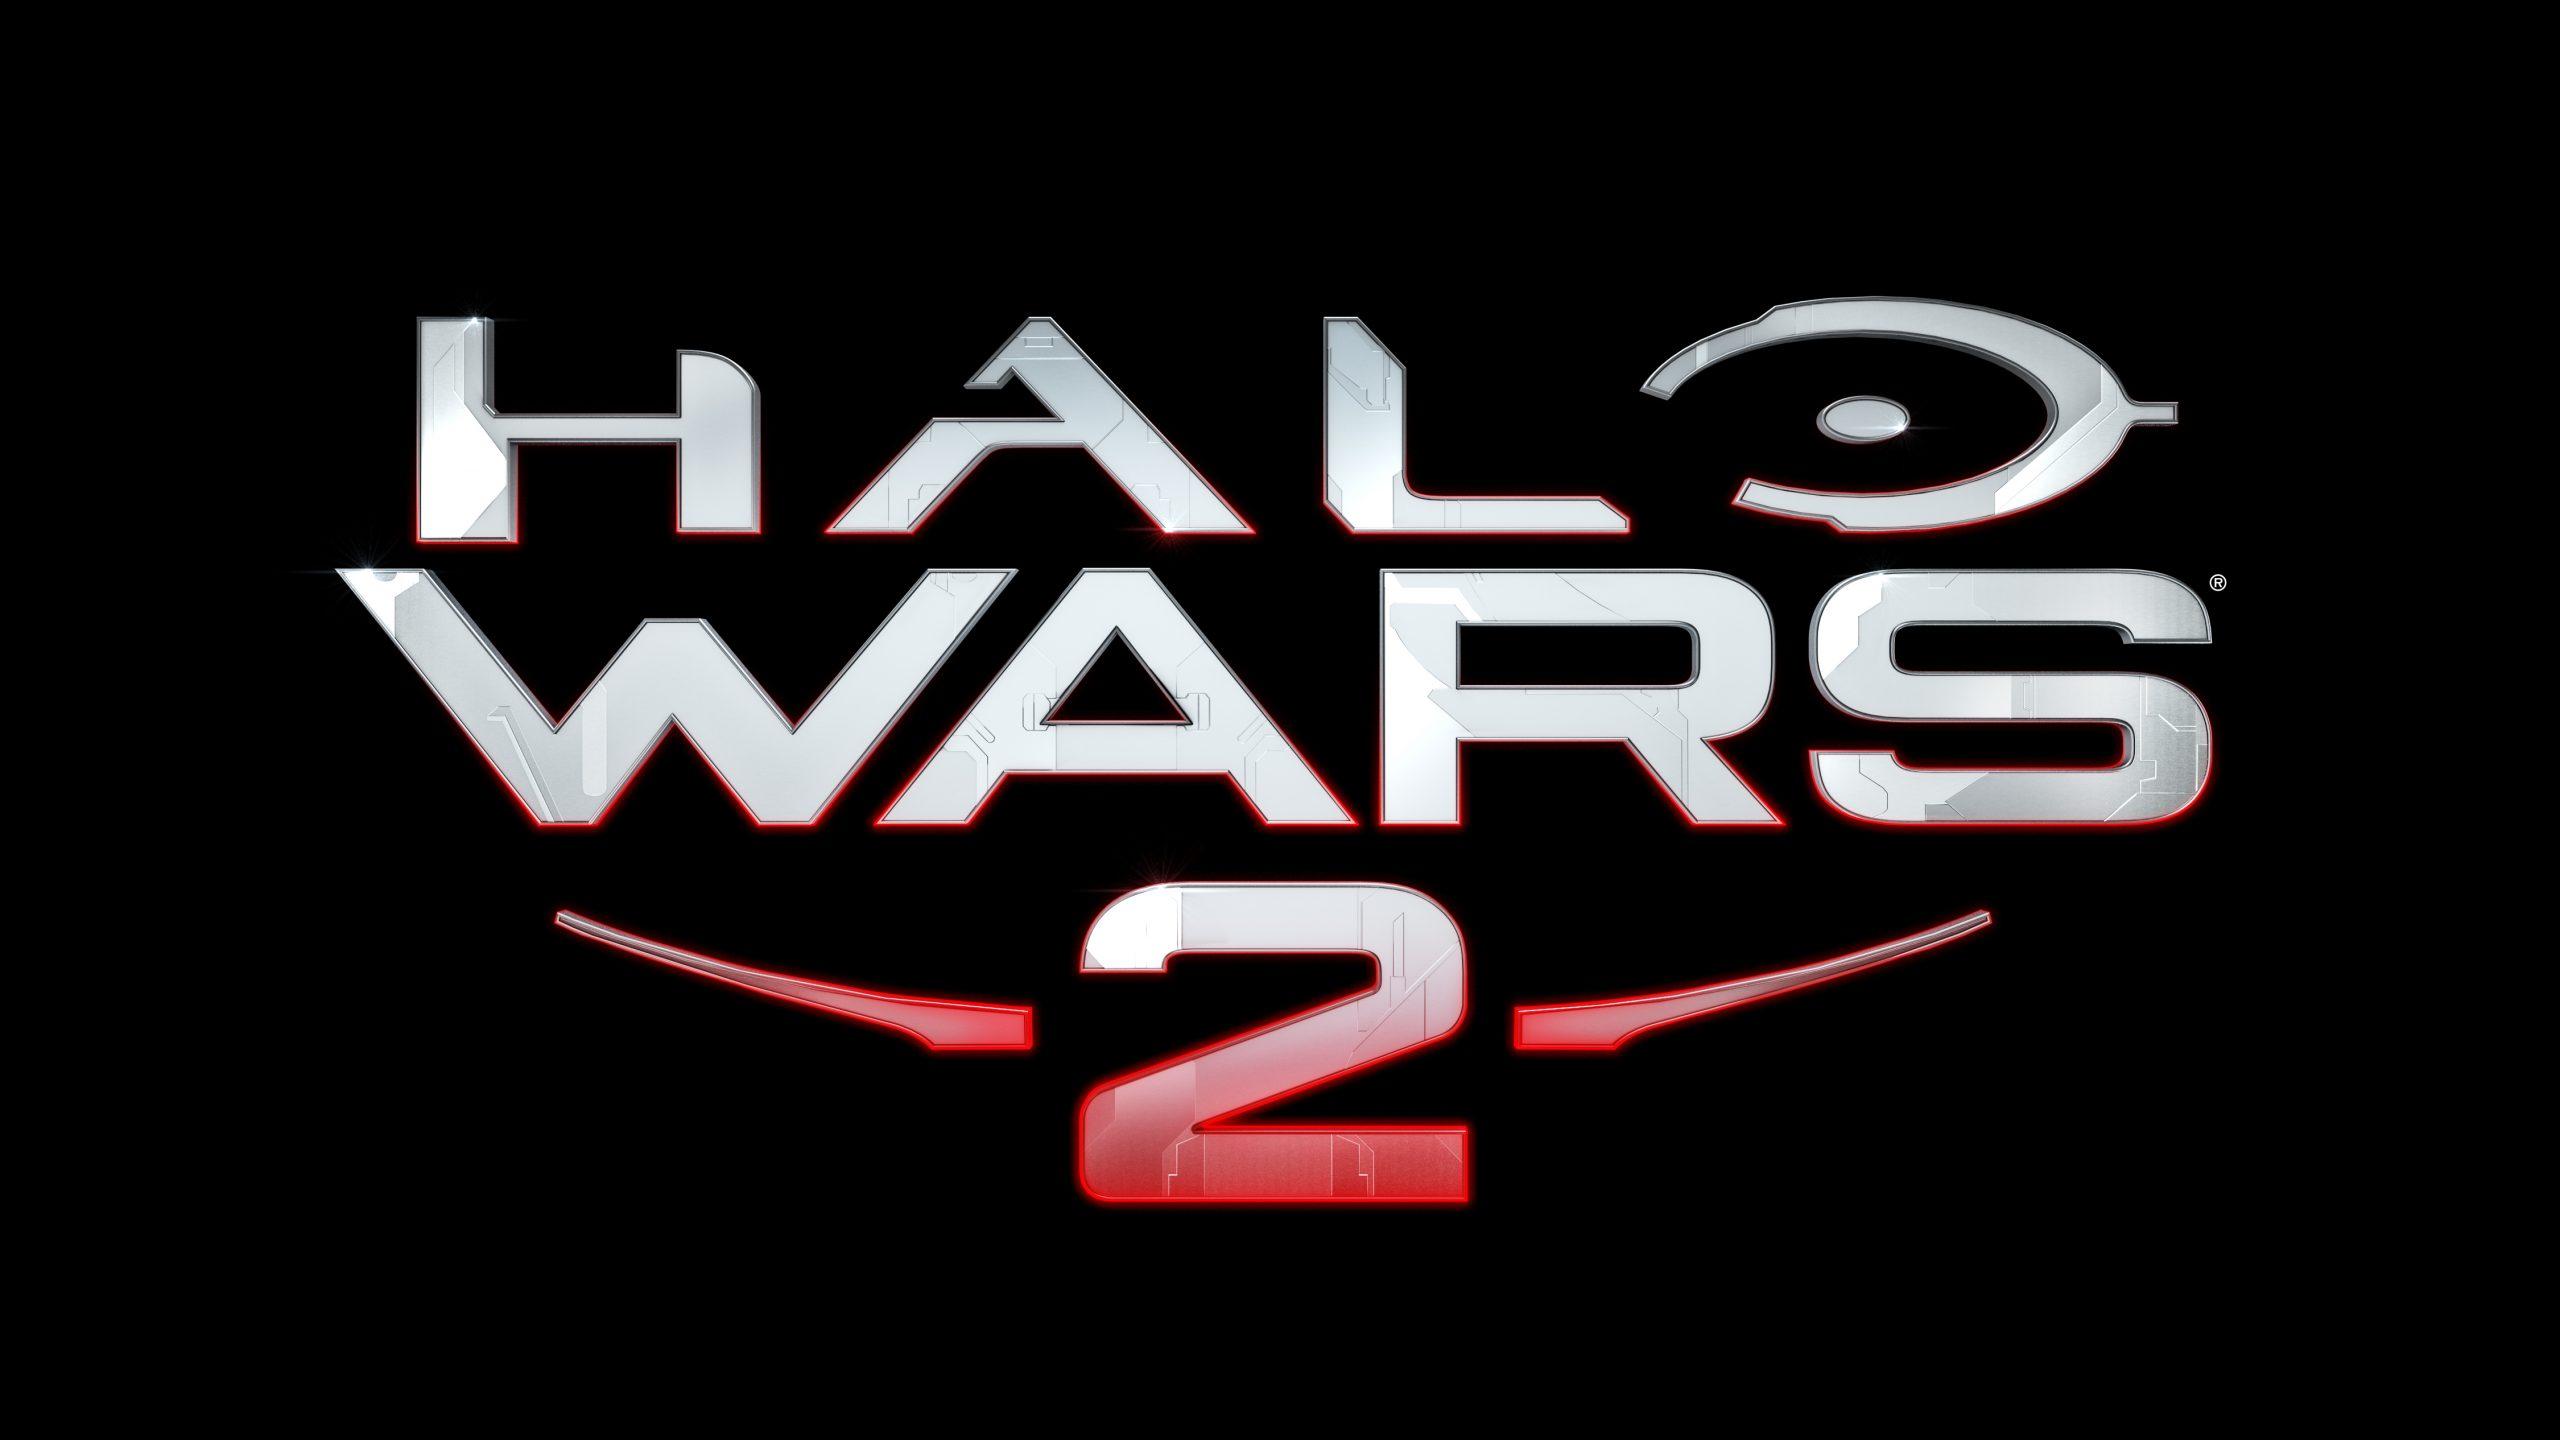 Halo Wars 2 Cracked